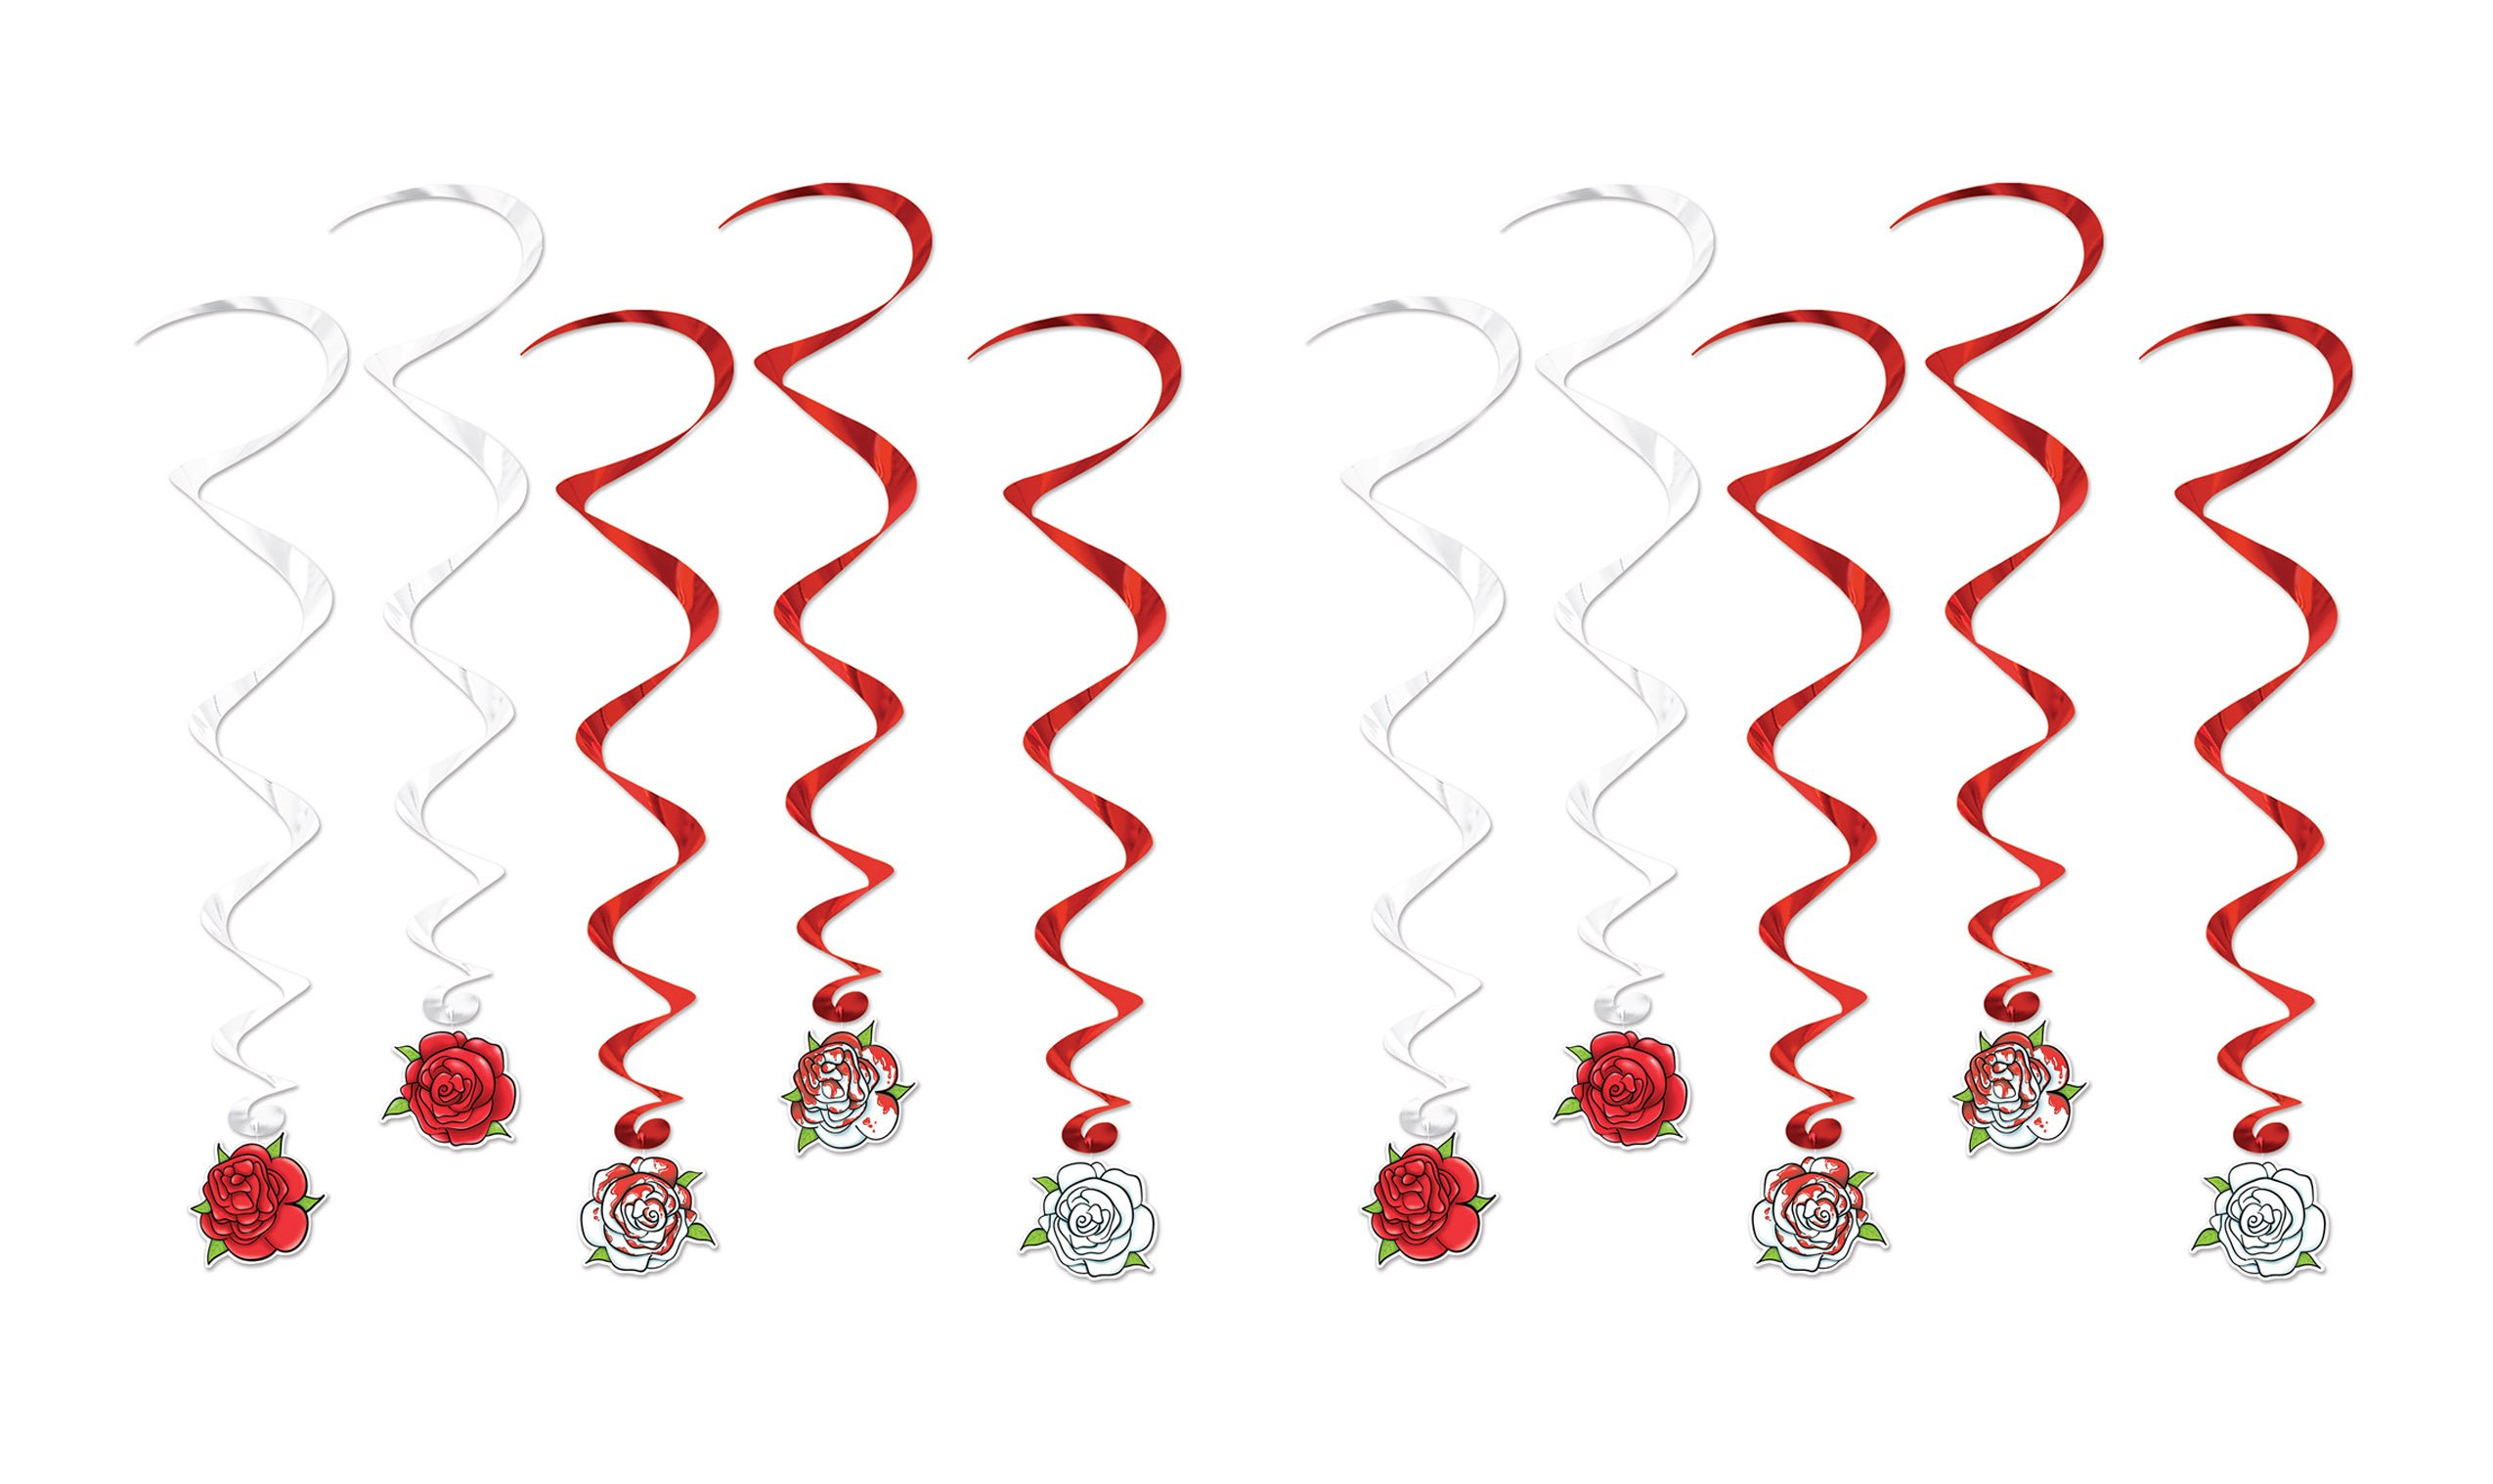 Beistle 52121, 10 Piece Rose Whirls, 3' by Beistle